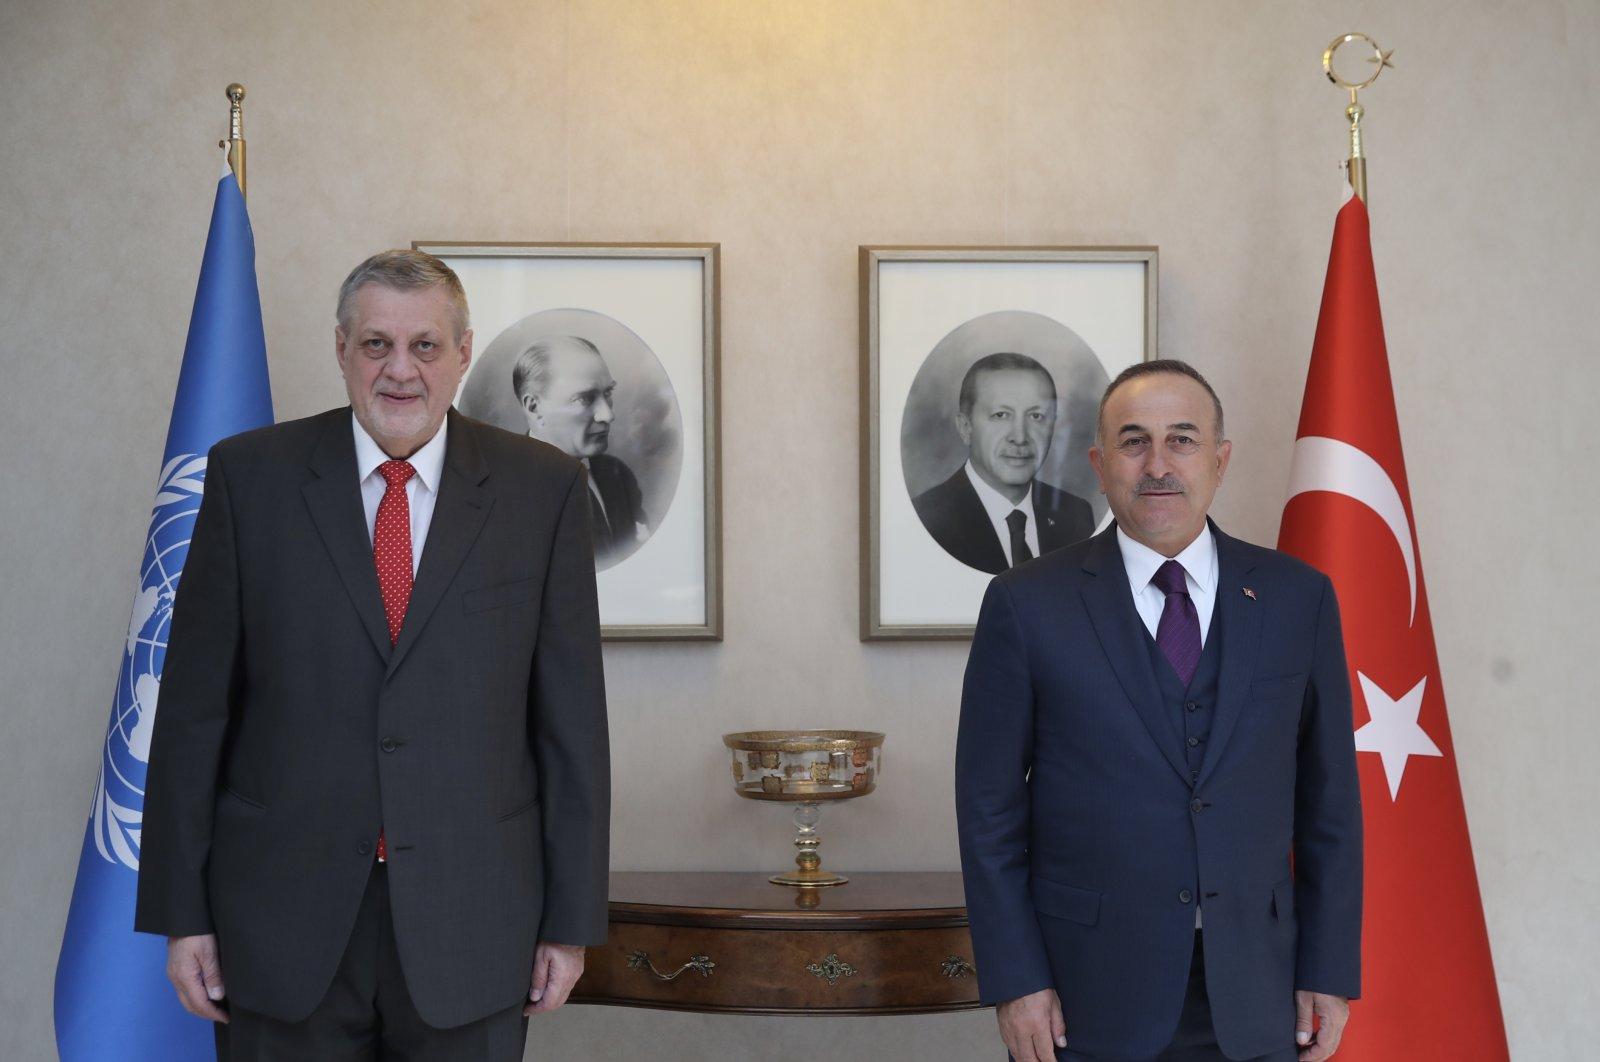 Foreign Minister Mevlüt Çavuşoğlu meets U.N. special envoy to Libya Jan Kubis in the capital Ankara, Turkey, March 2, 2021. (AA Photo)